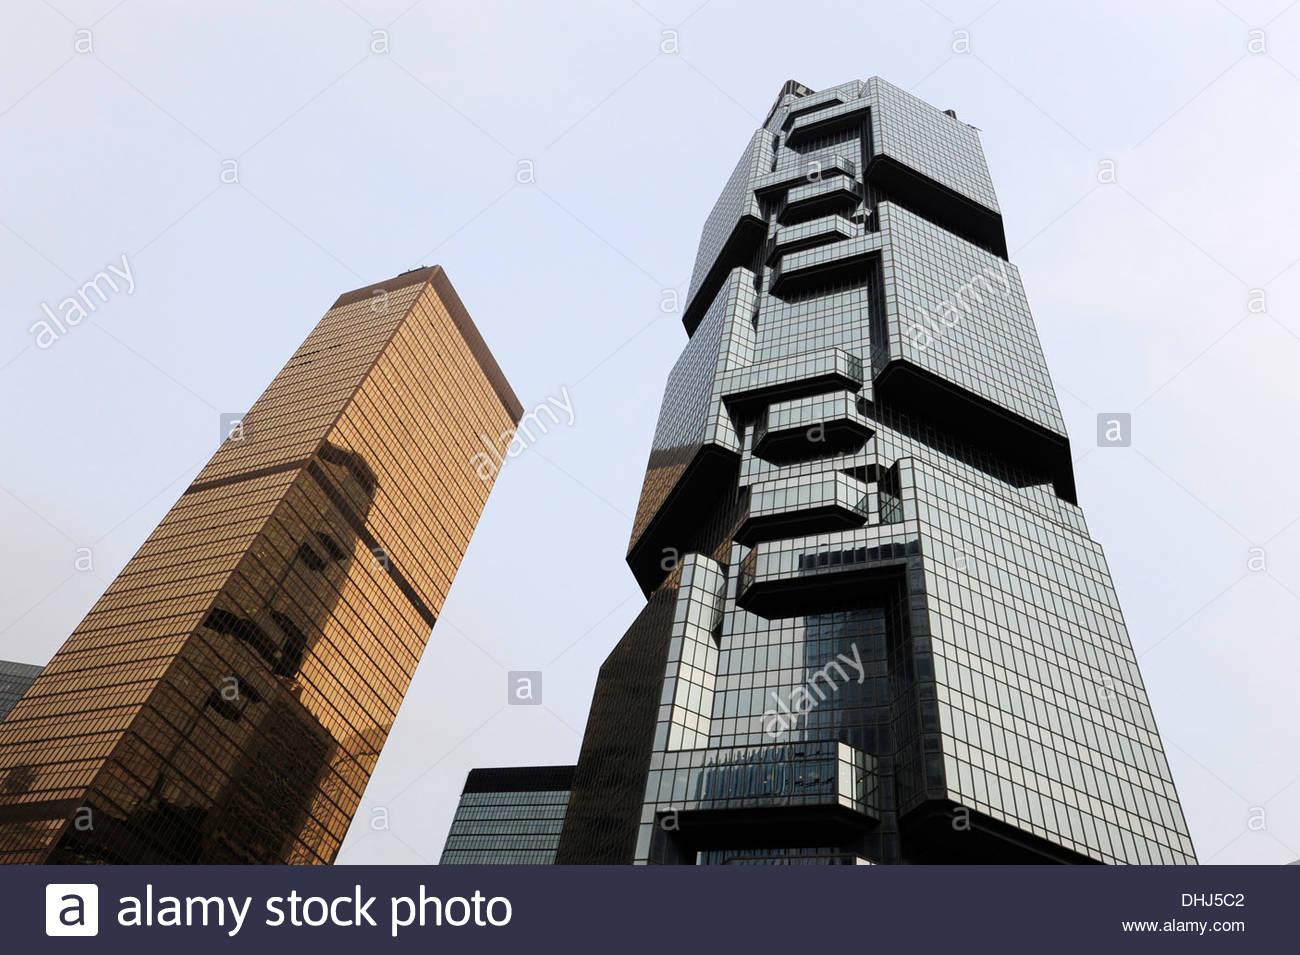 Dos torres, el Lejano Oriente y el Centro de Finanzas de Lippo Center en Chung Wan, Distrito Central, la Isla de Hong Kong, Hong Kong, China, como Imagen De Stock